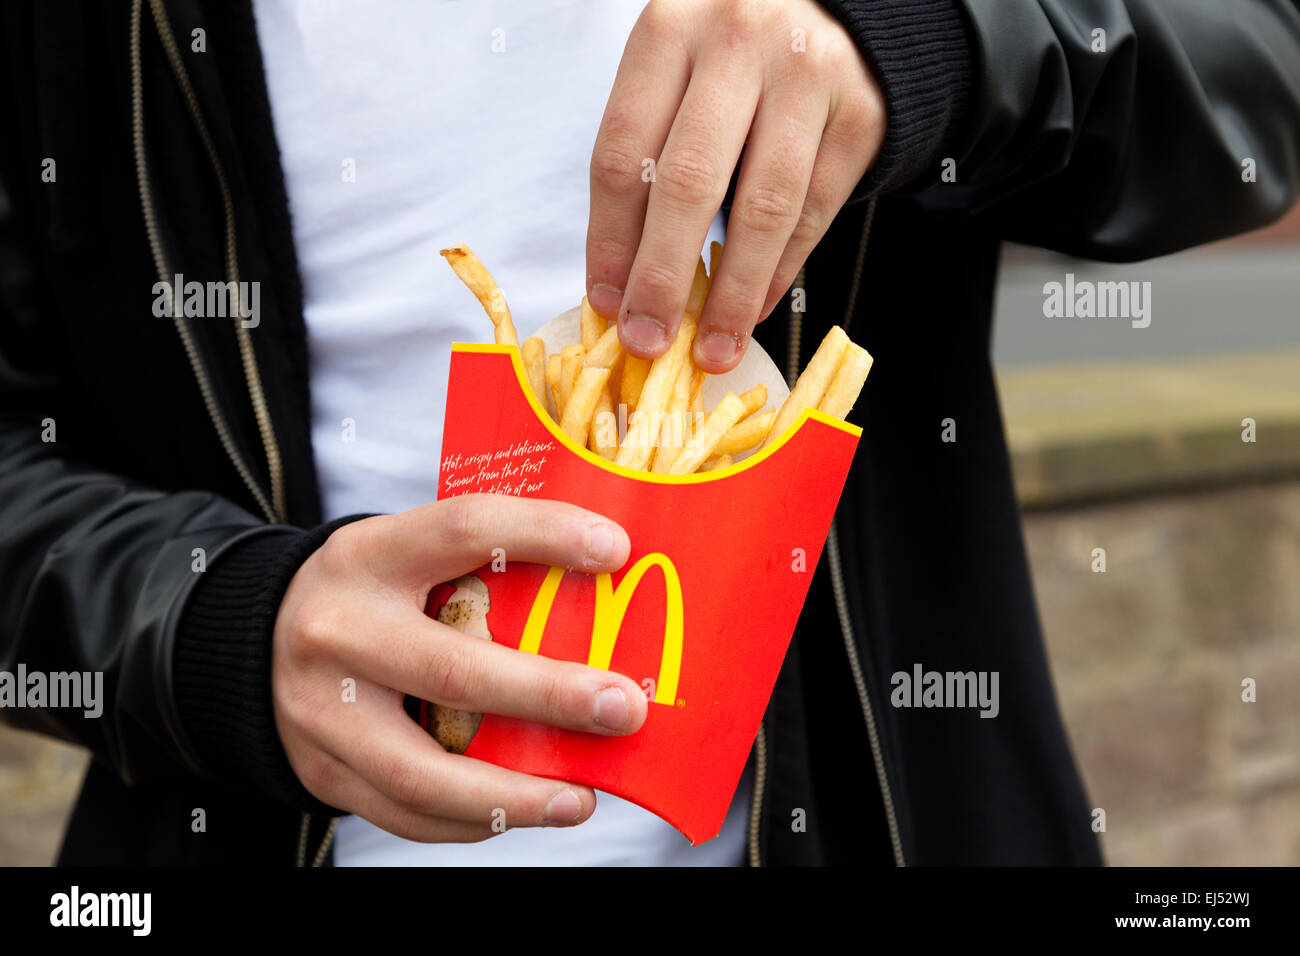 Mcdonald s fries - Stock Image